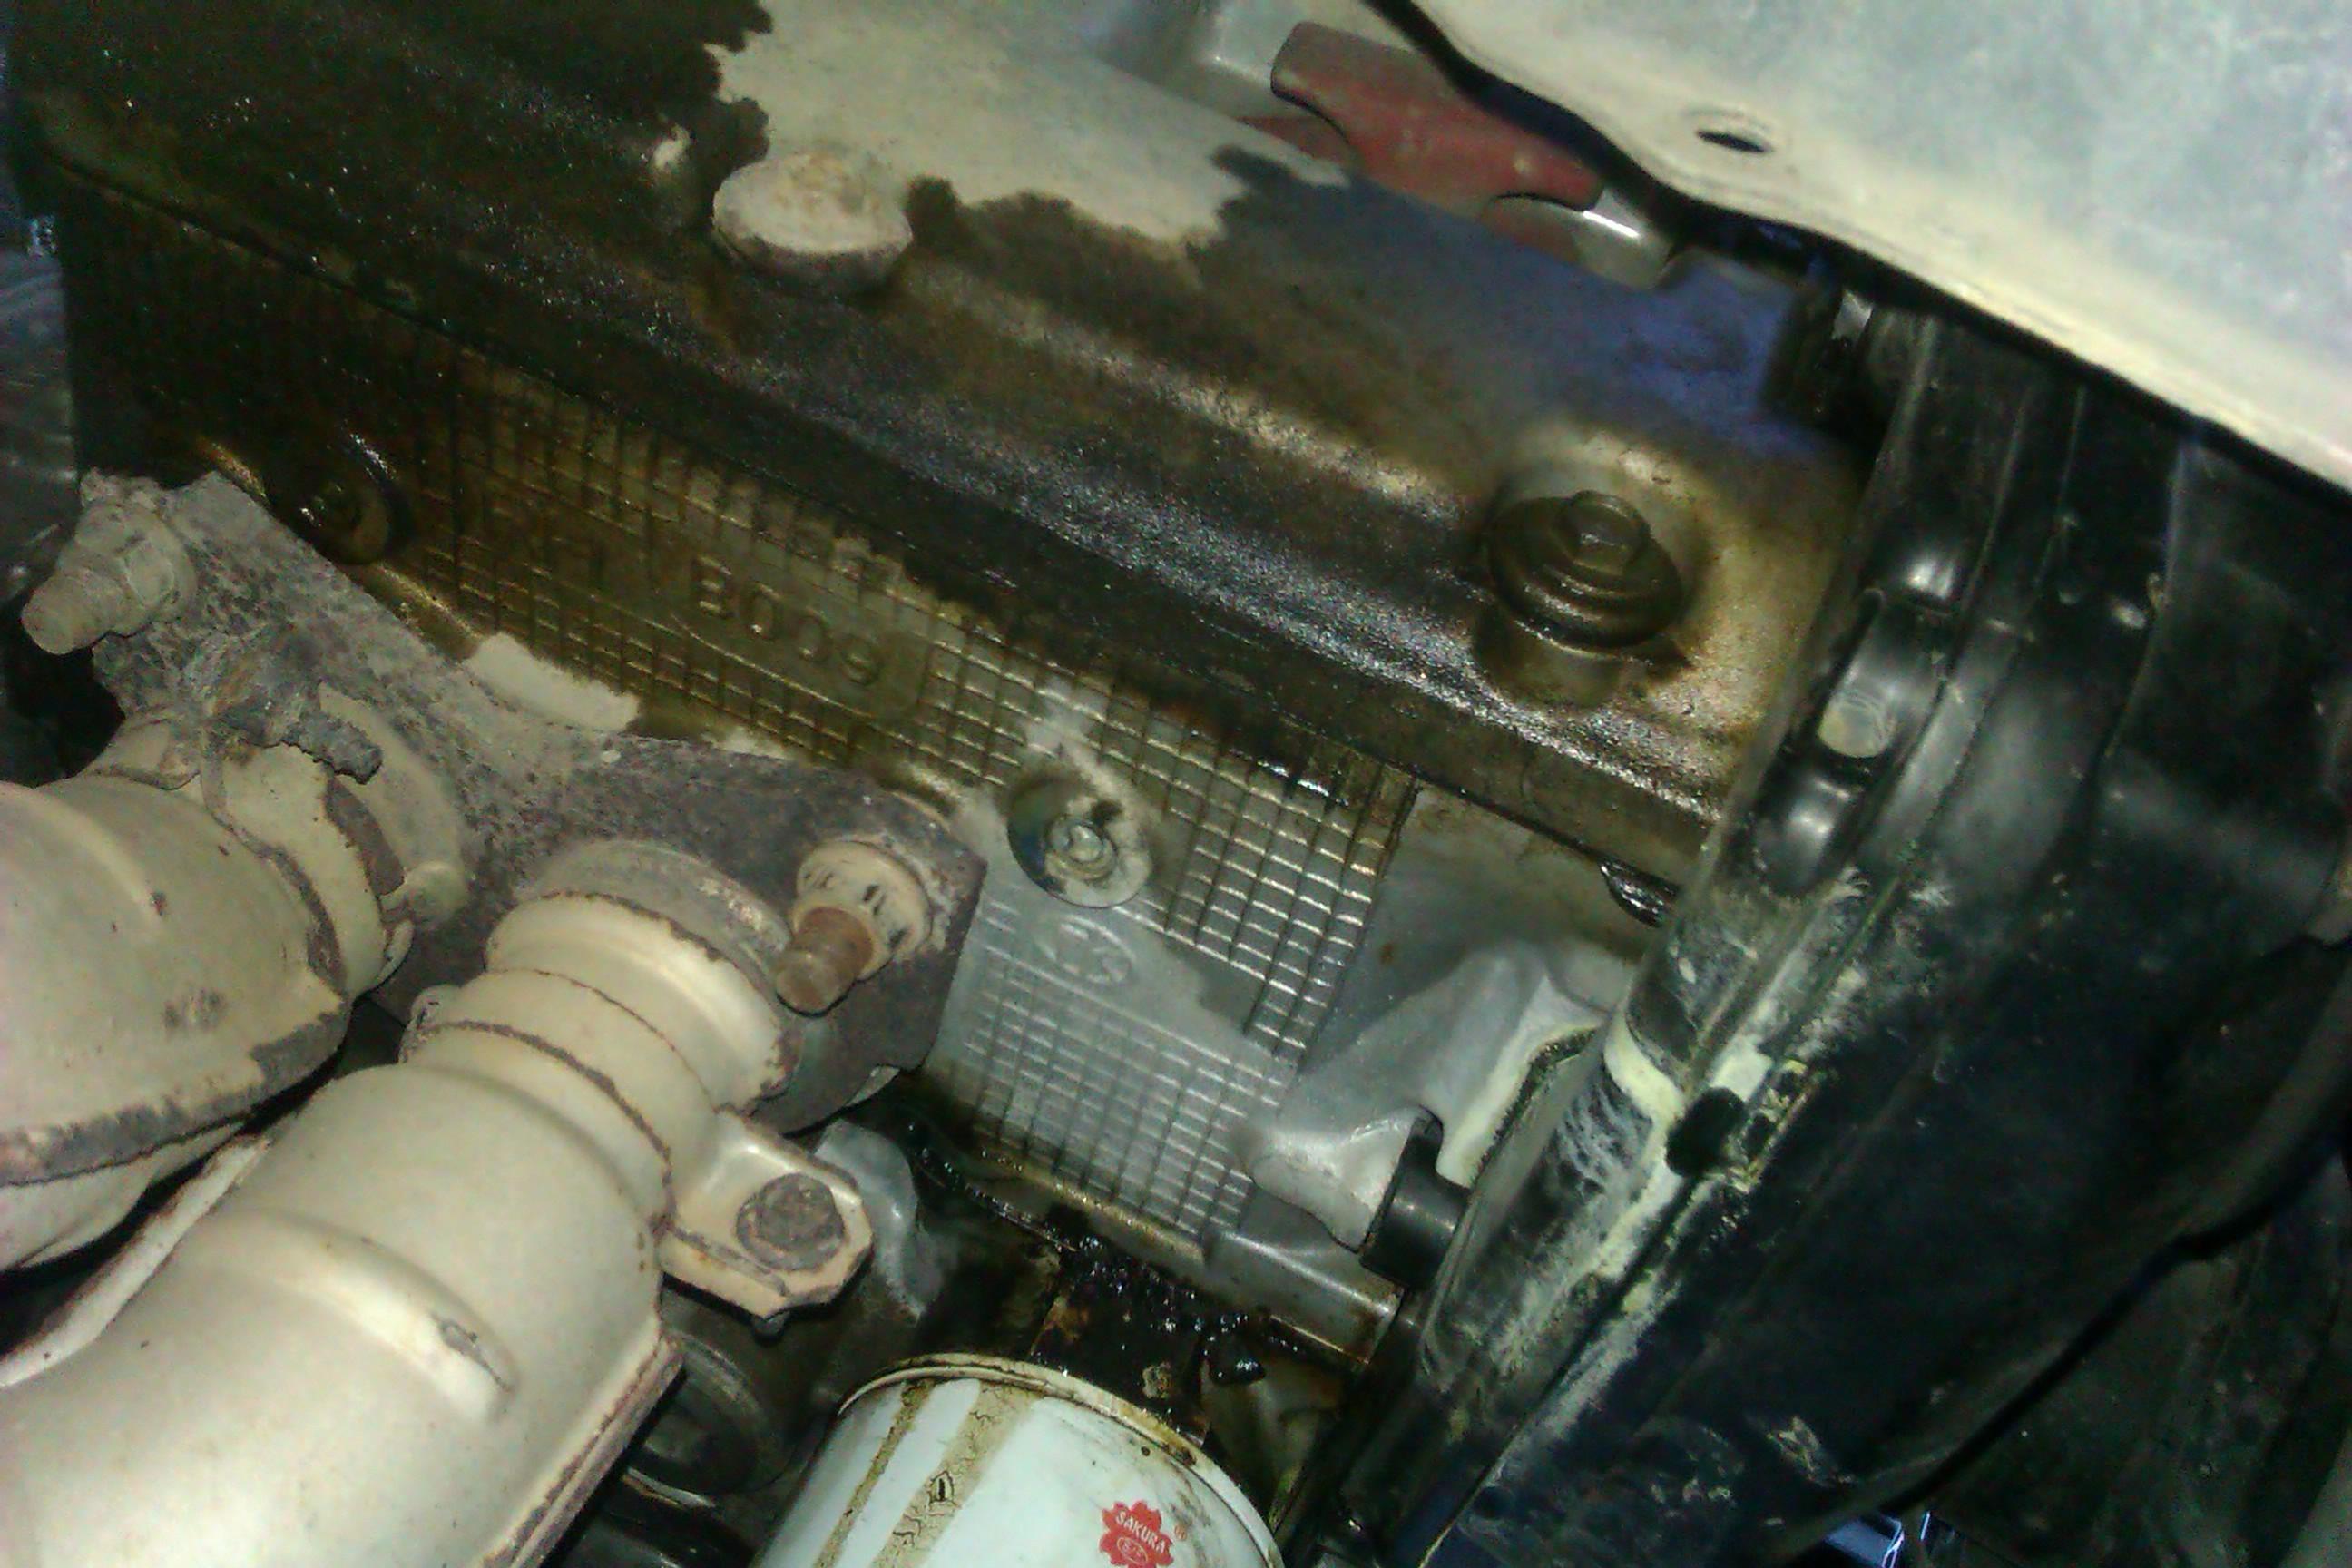 Oil leak photos. - Subaru Outback - Subaru Outback Forums